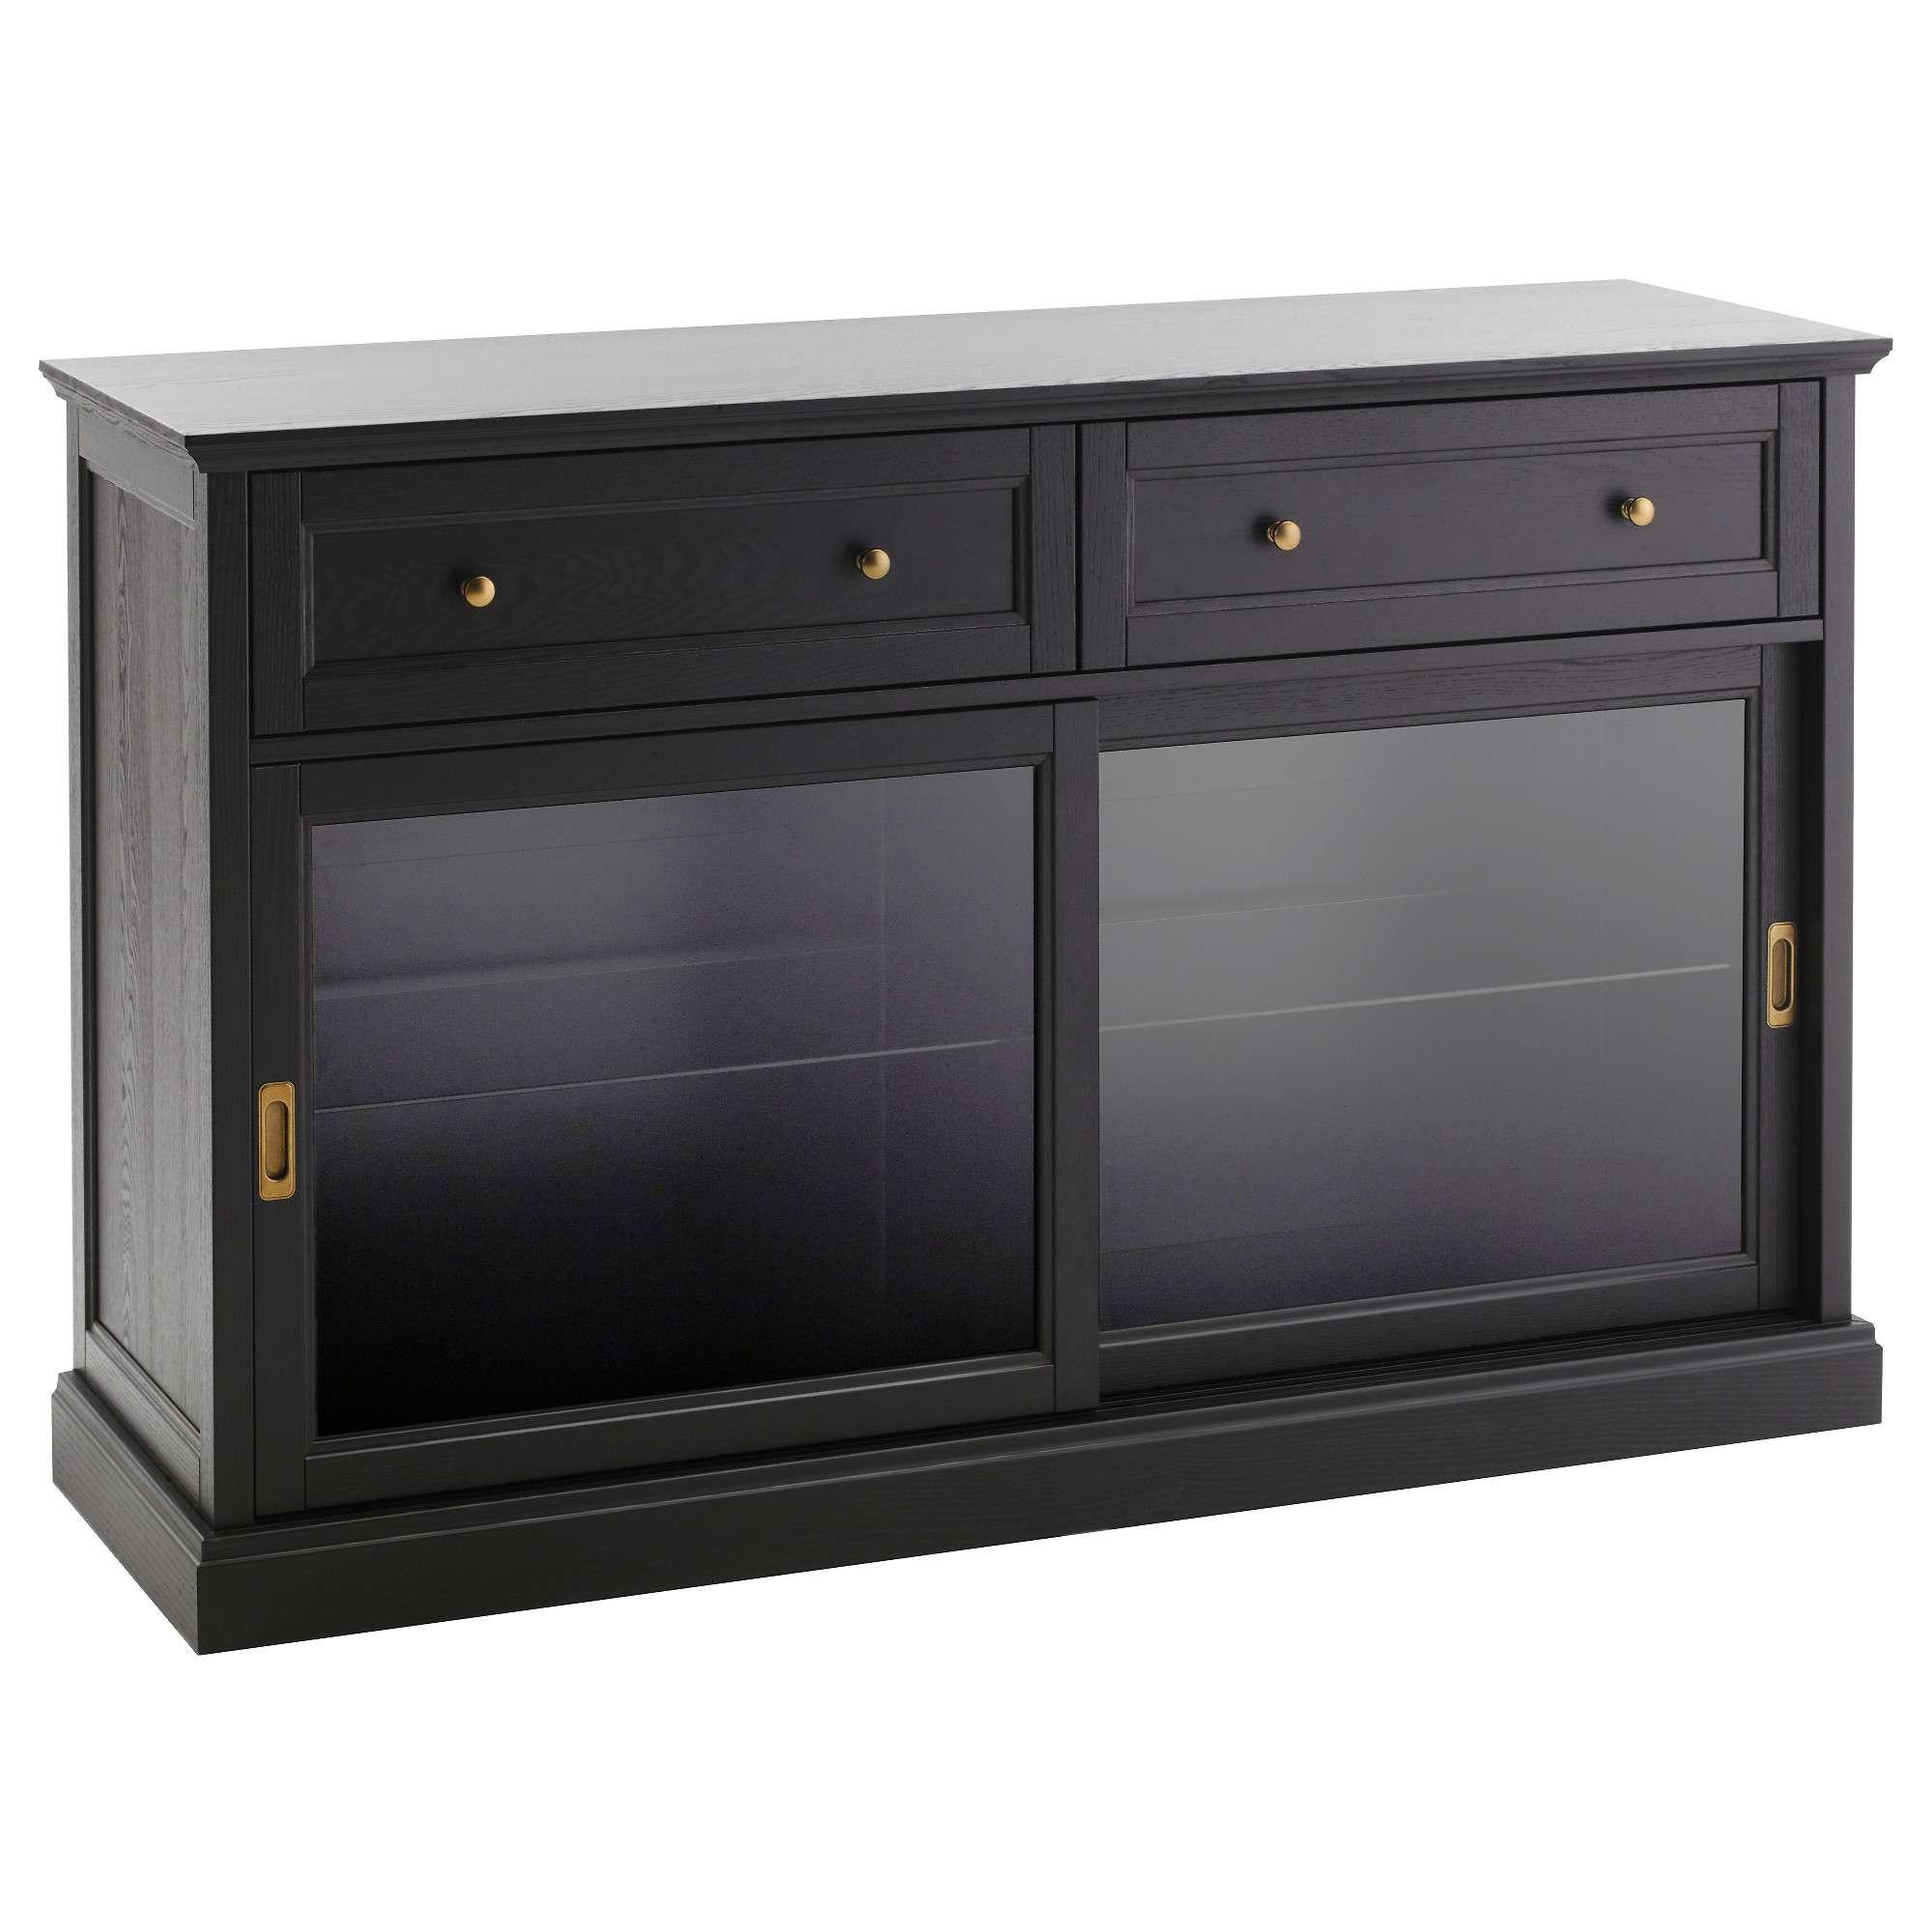 Malsjö Sideboard Basic Unit Black Stained 145x92 Cm – Ikea Inside Glass Door Buffet Sideboards (View 18 of 20)